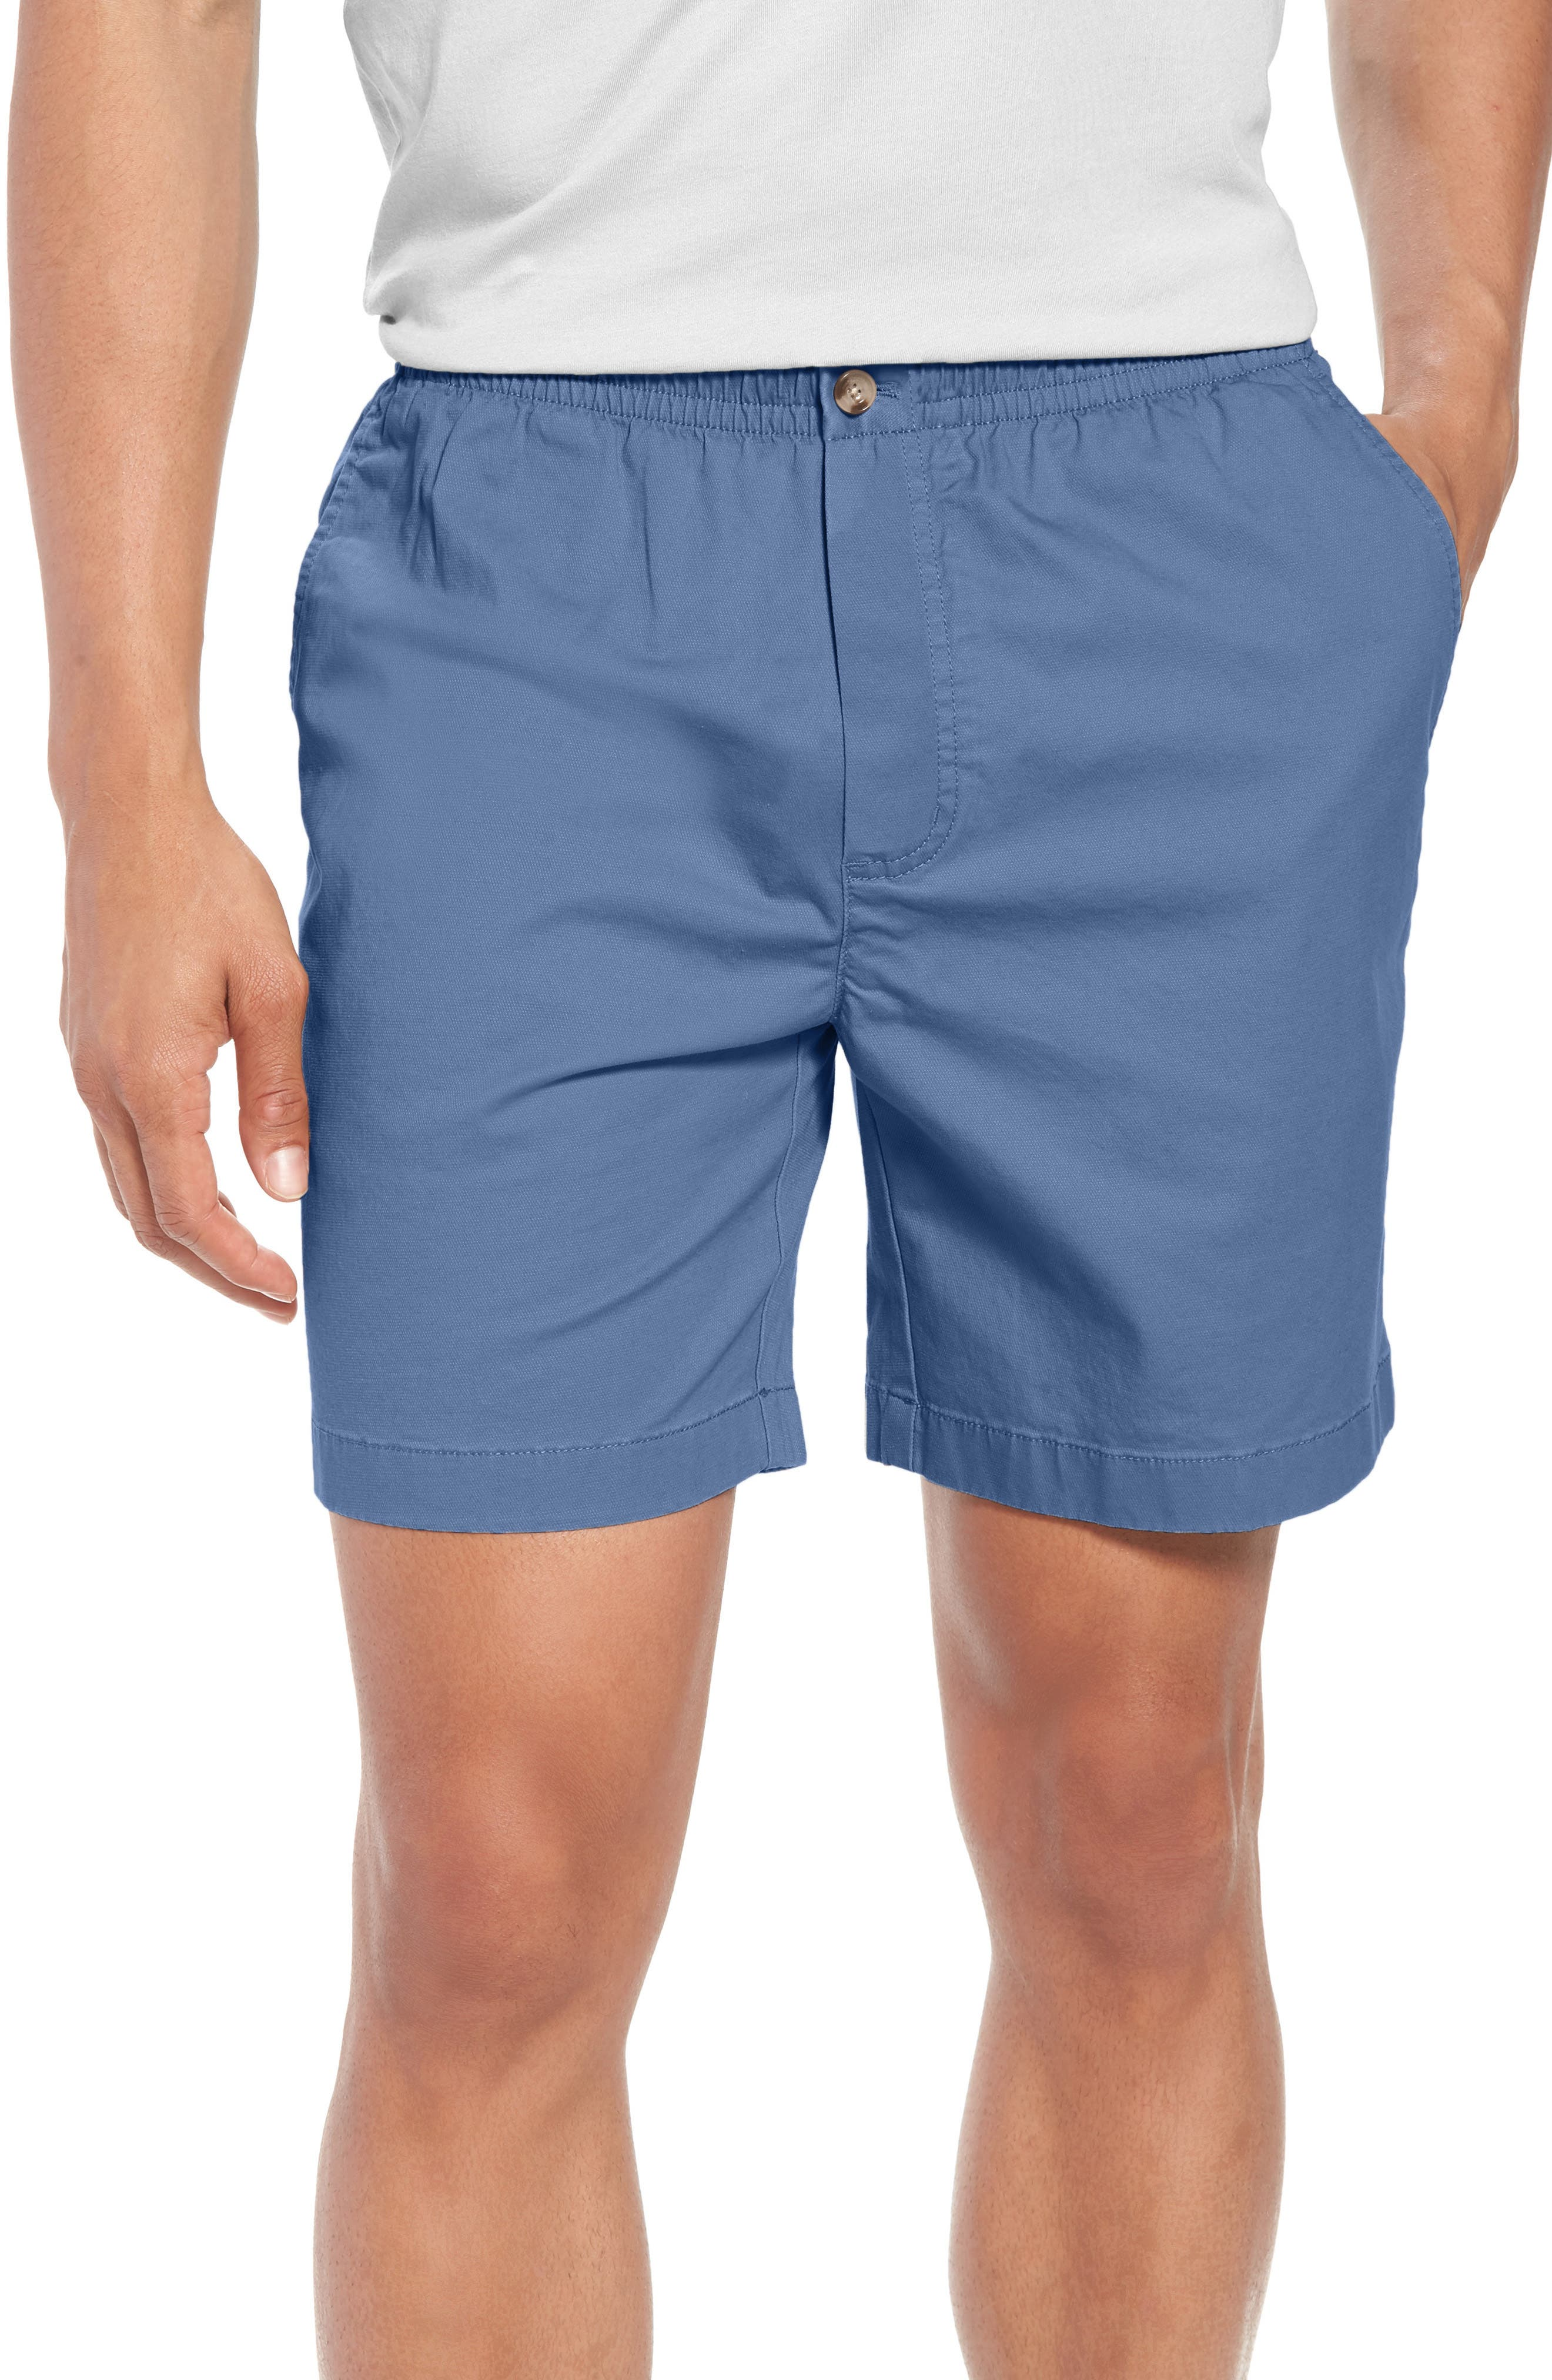 Jetty Stretch Cotton Shorts,                             Main thumbnail 1, color,                             Moonshine